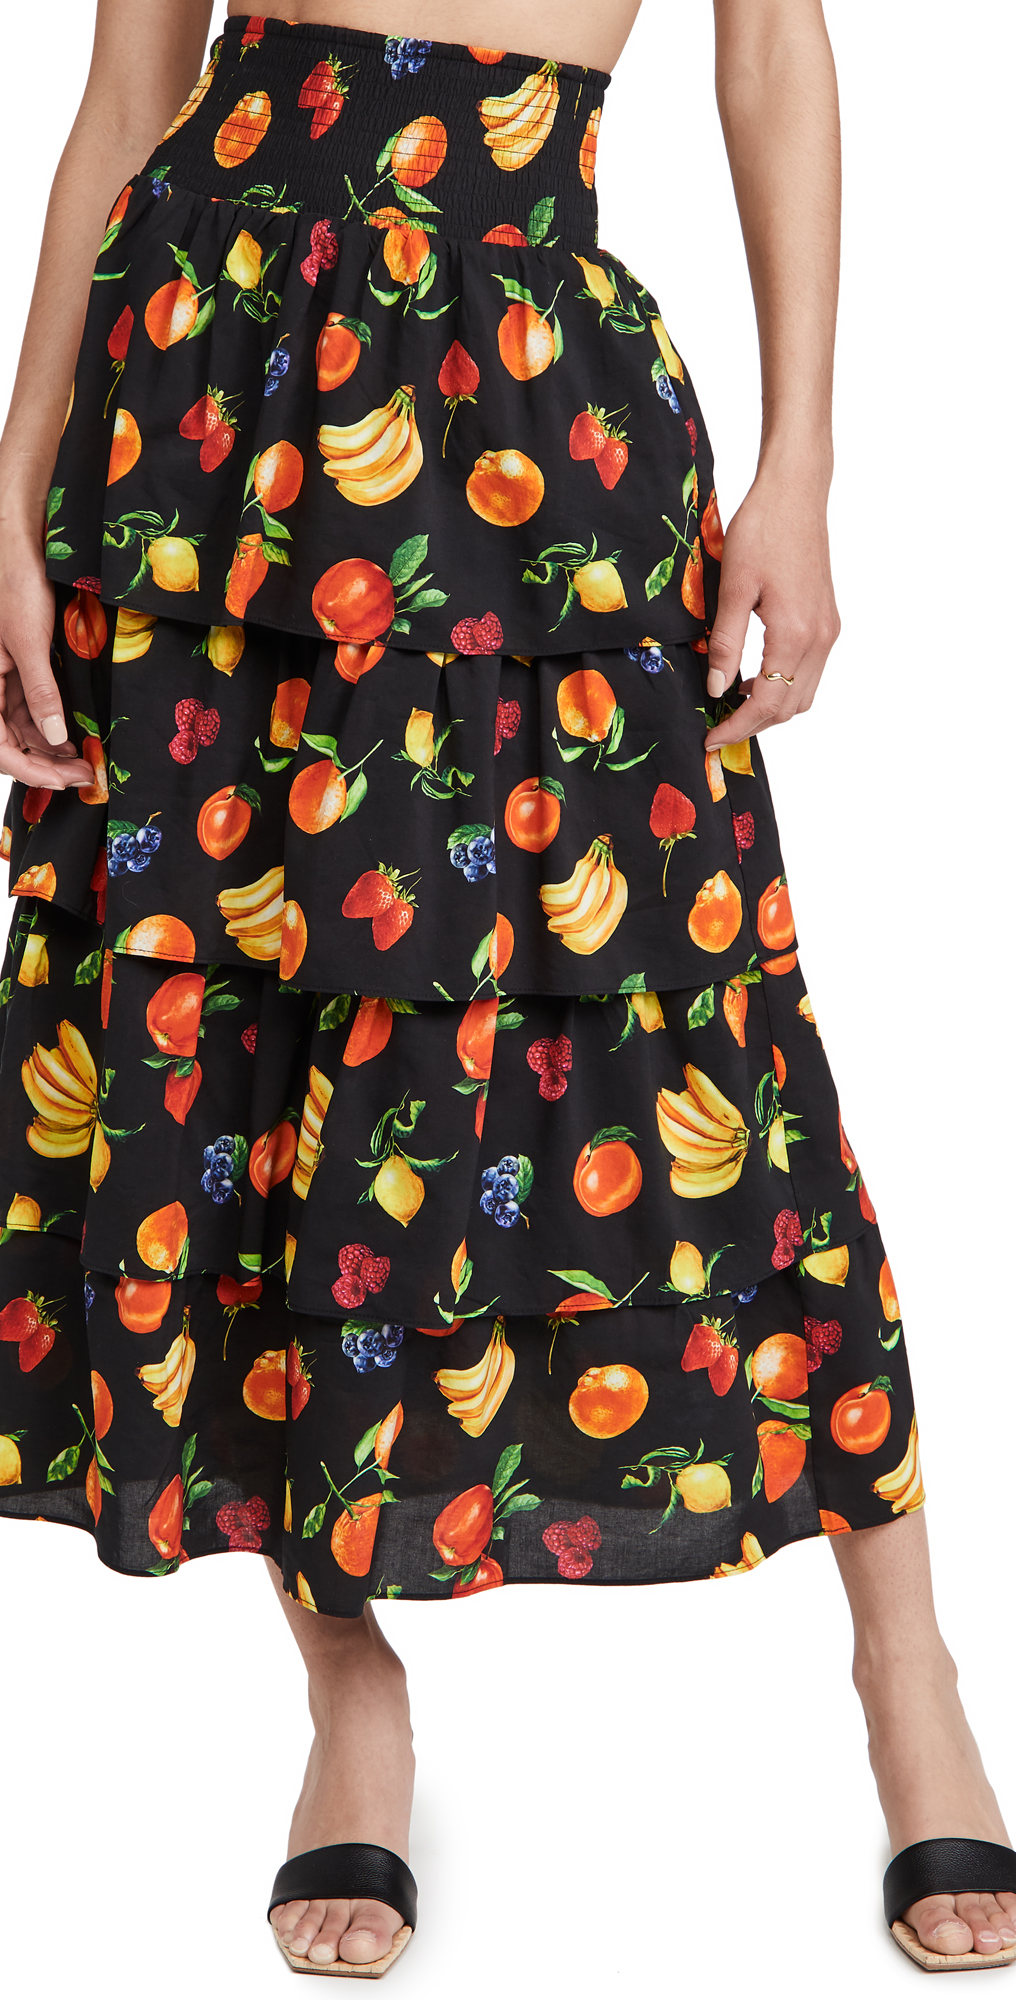 Weworewhat Paloma Tiered Printed Skirt In Black Multi